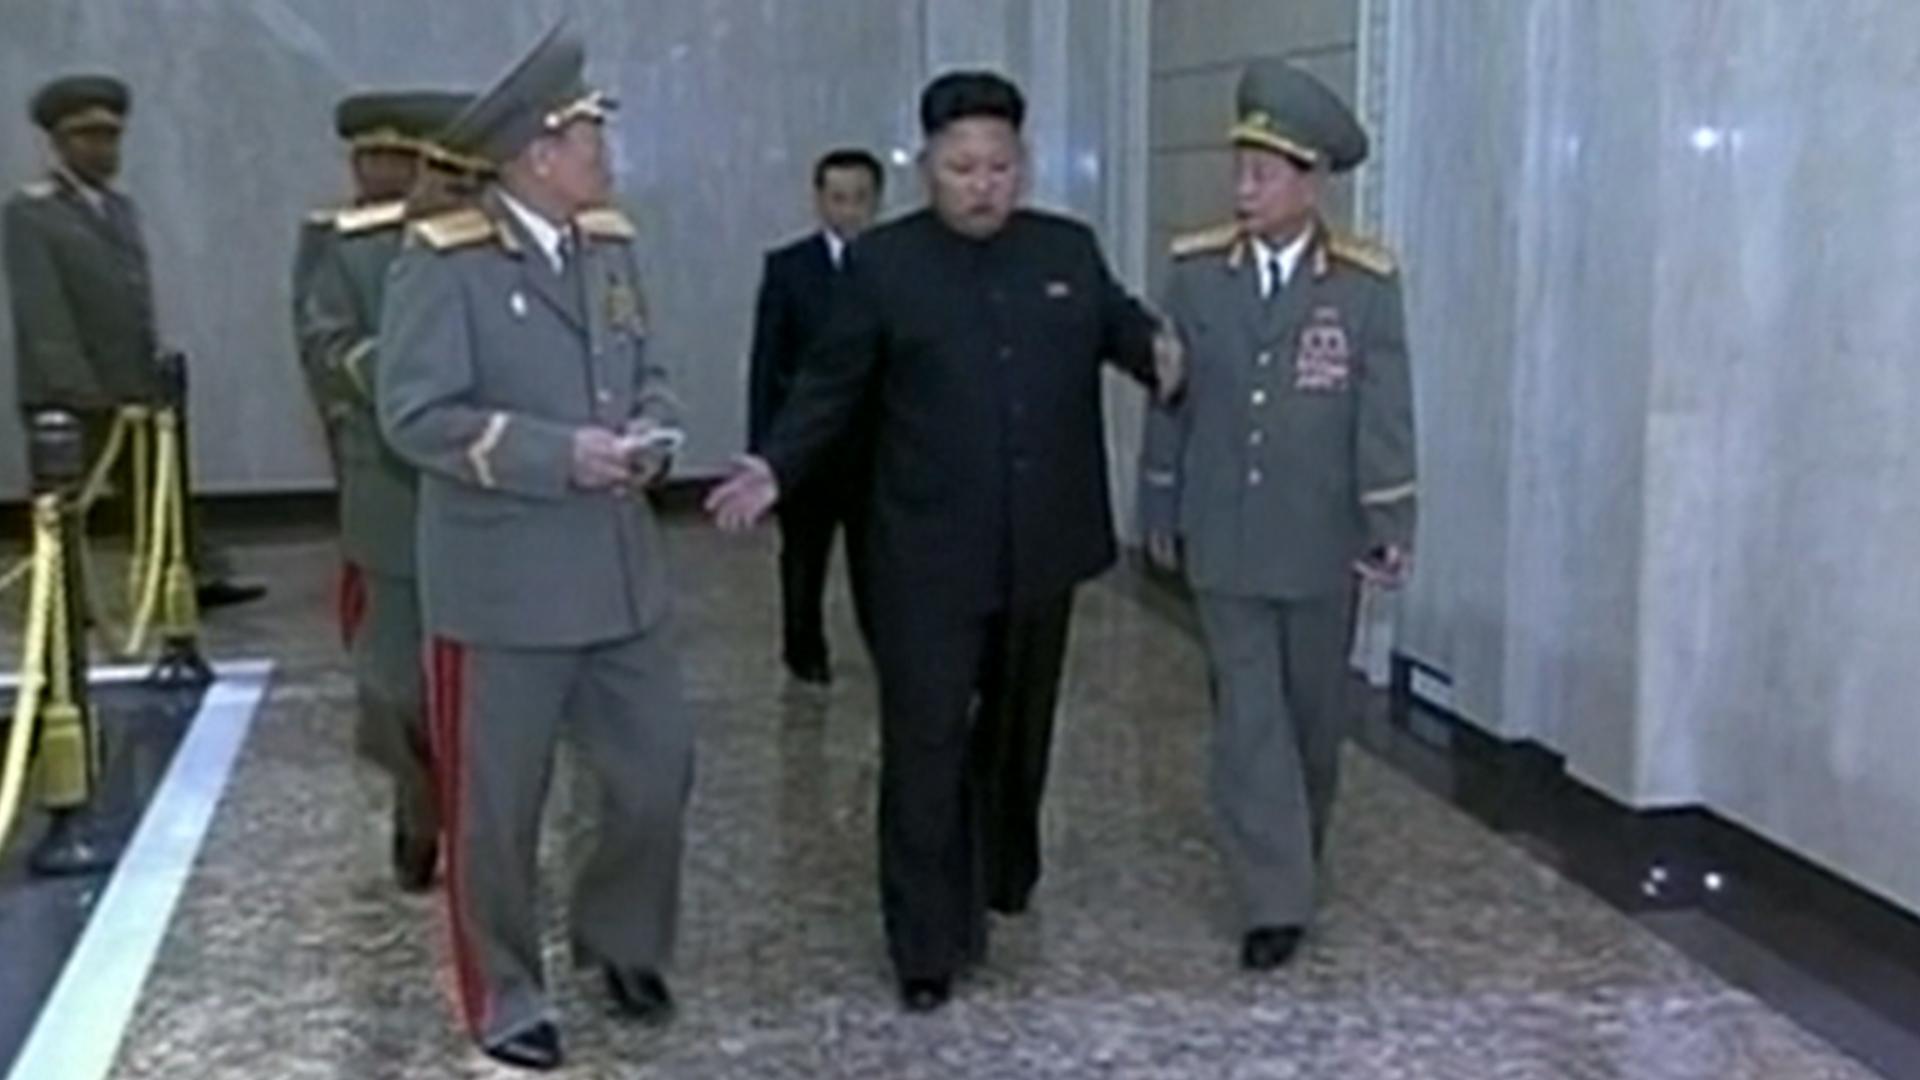 Family 'Devastated' by North Korean Prisoner Kenneth Bae's Pain